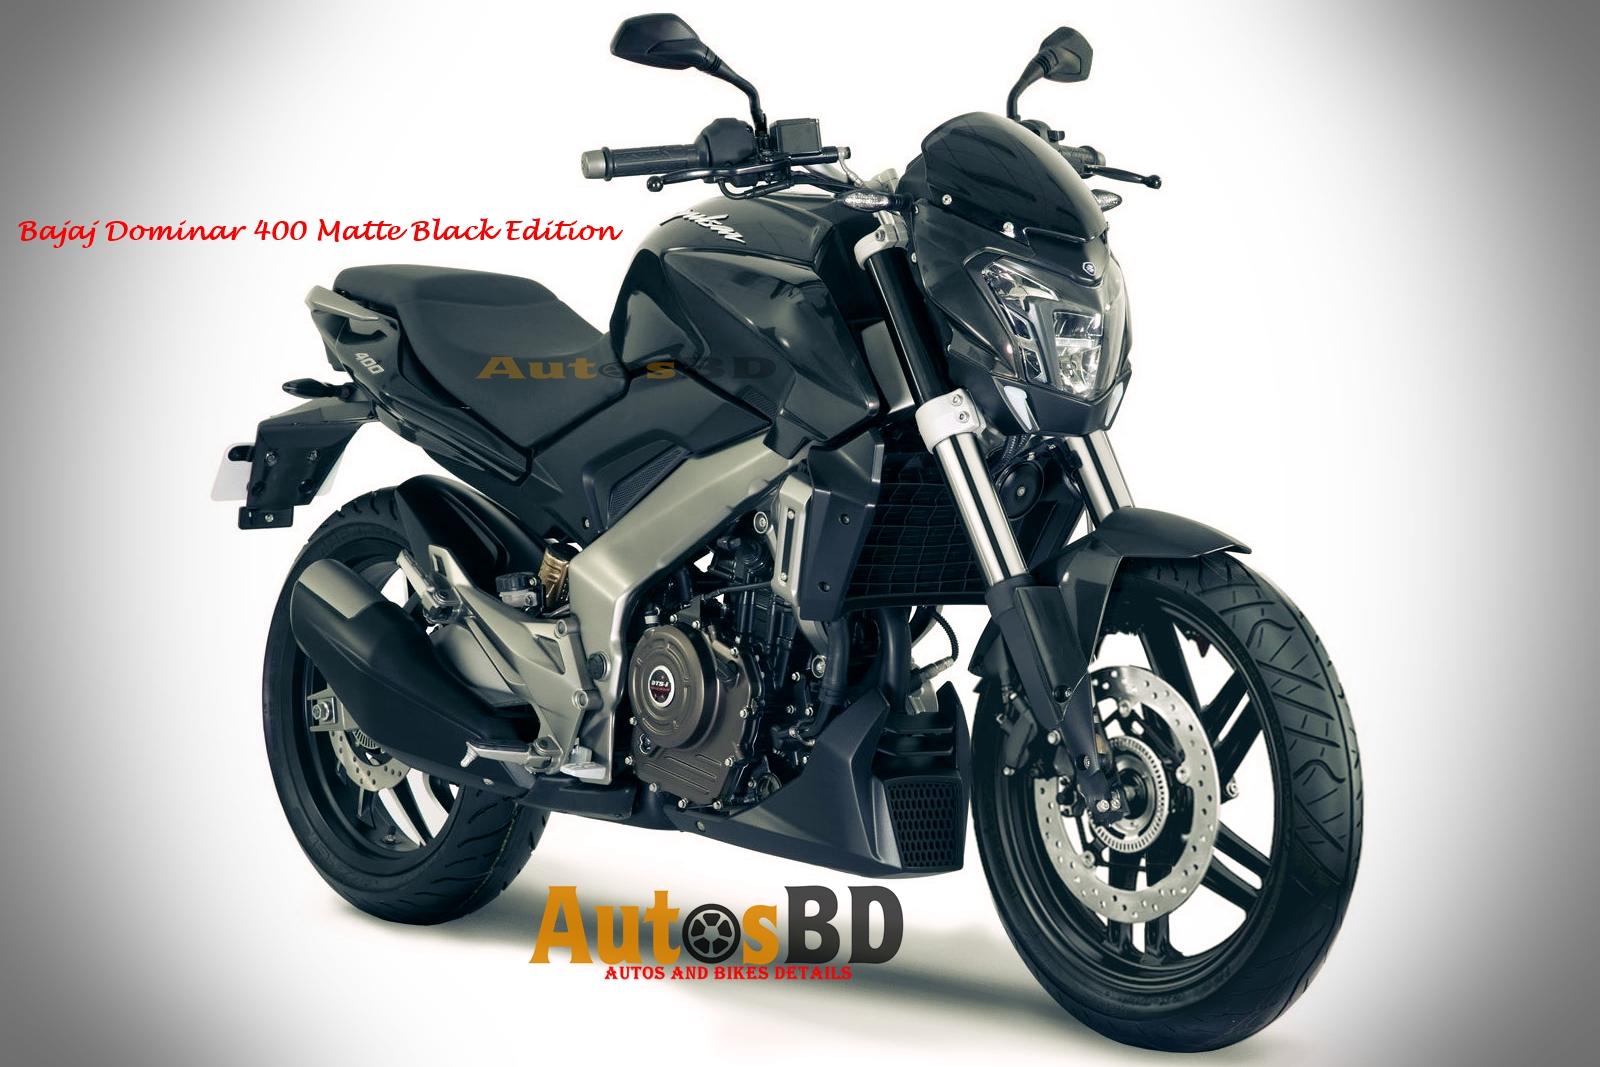 Bajaj Dominar 400 Matte Black Edition Motorcycle Specification